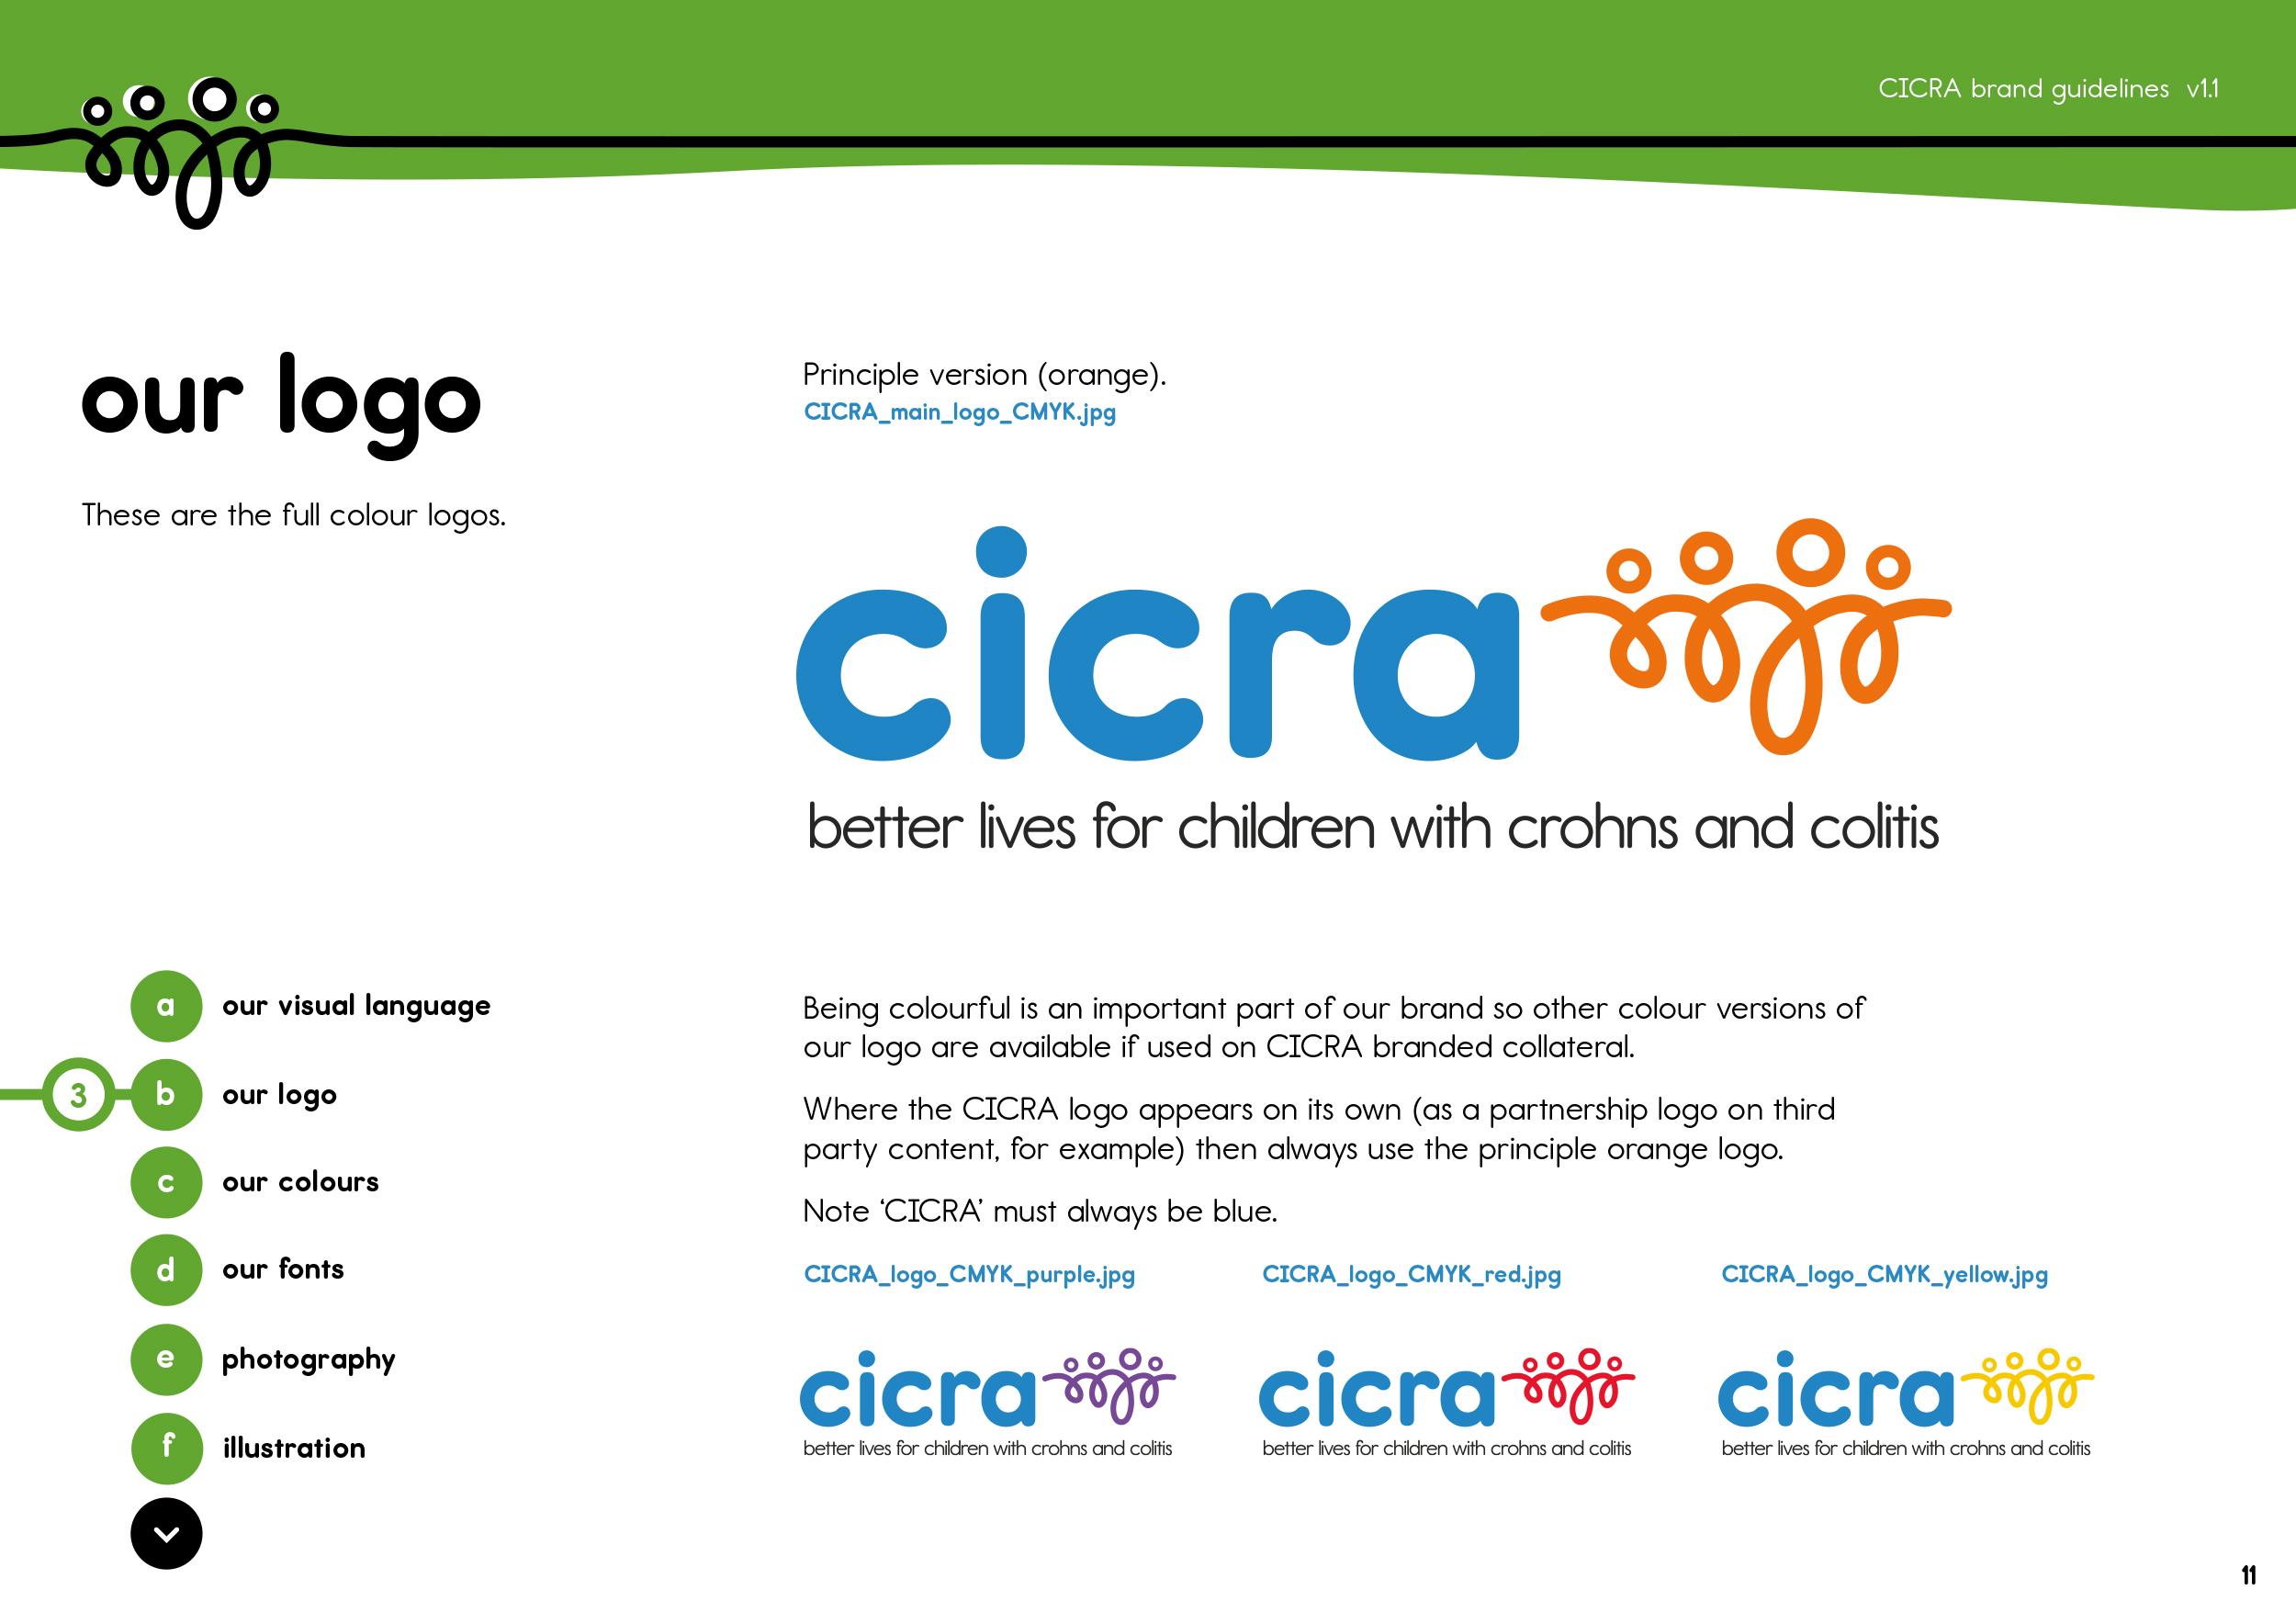 0188 CICRA Brand Guidelines_V1.1-11.jpg